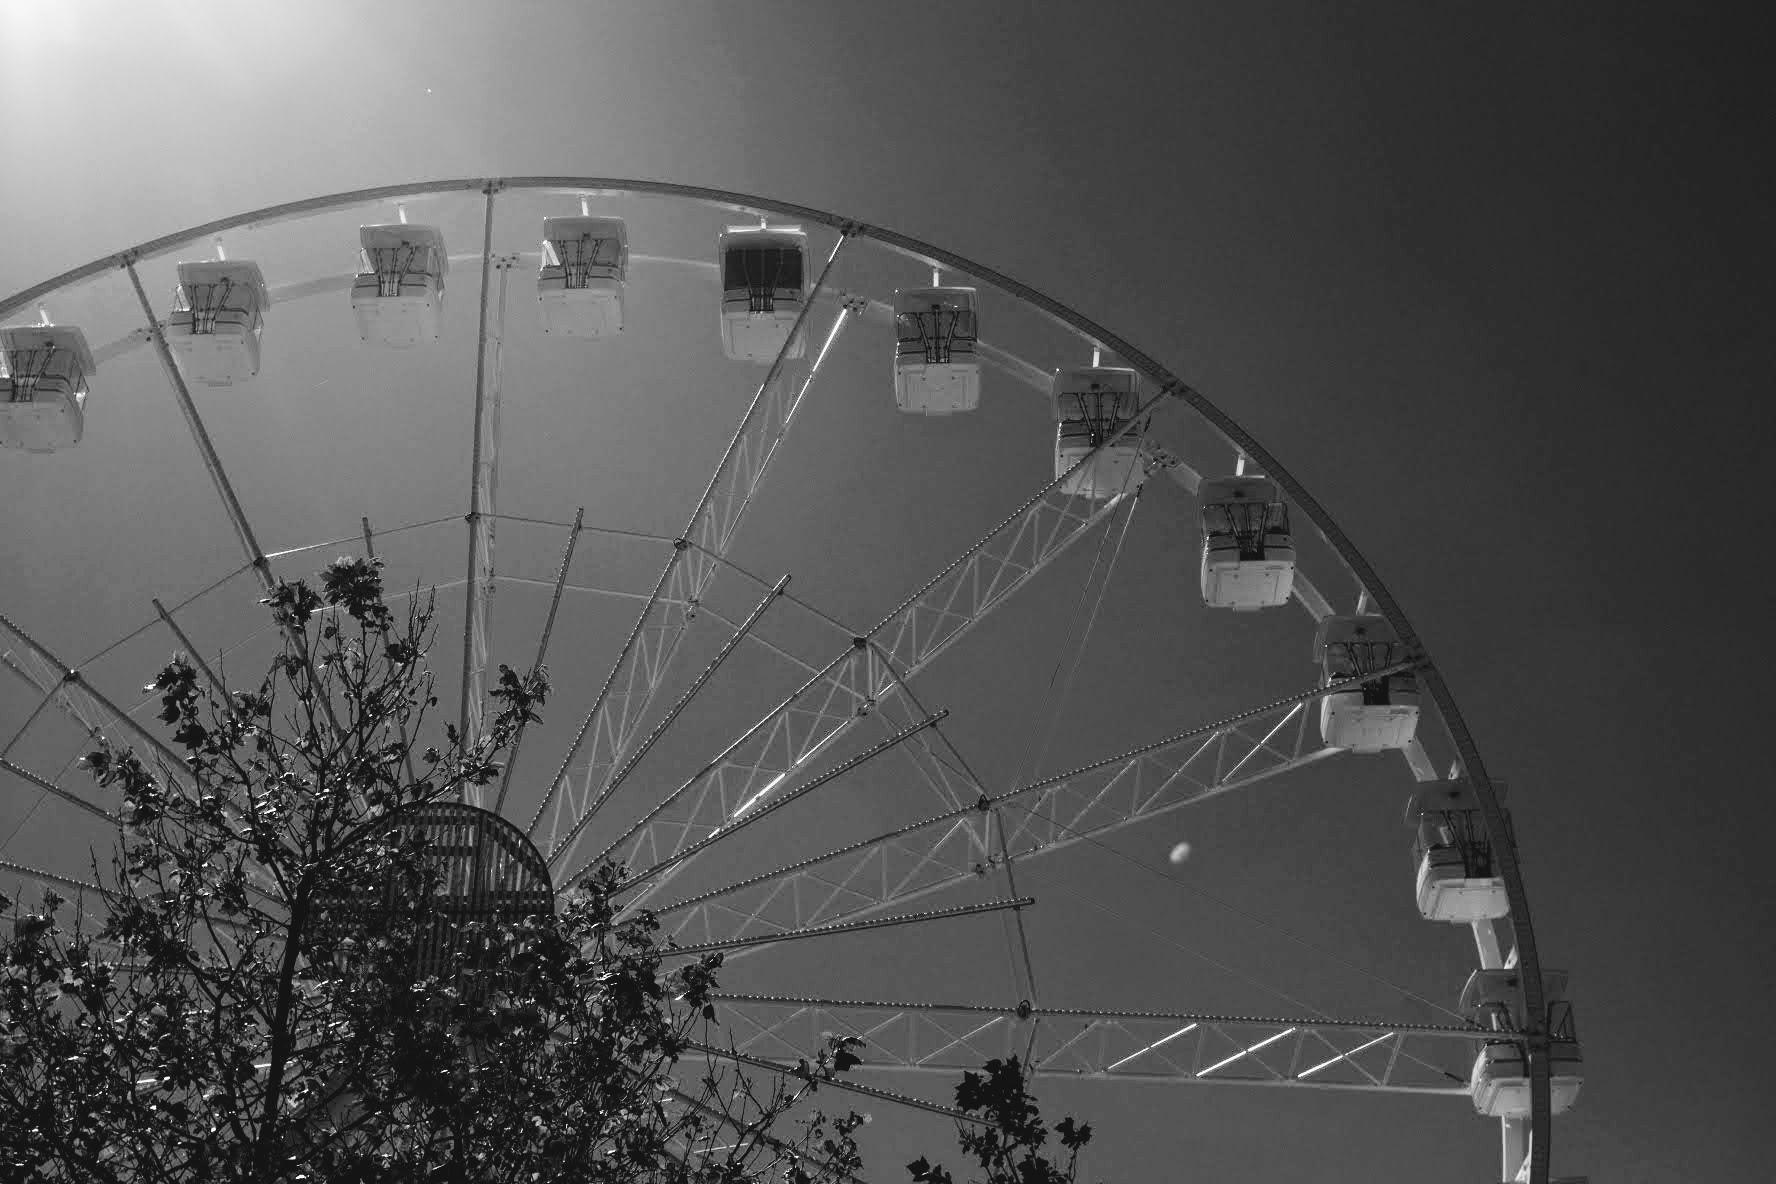 Ruota panoramica in bianco e nero